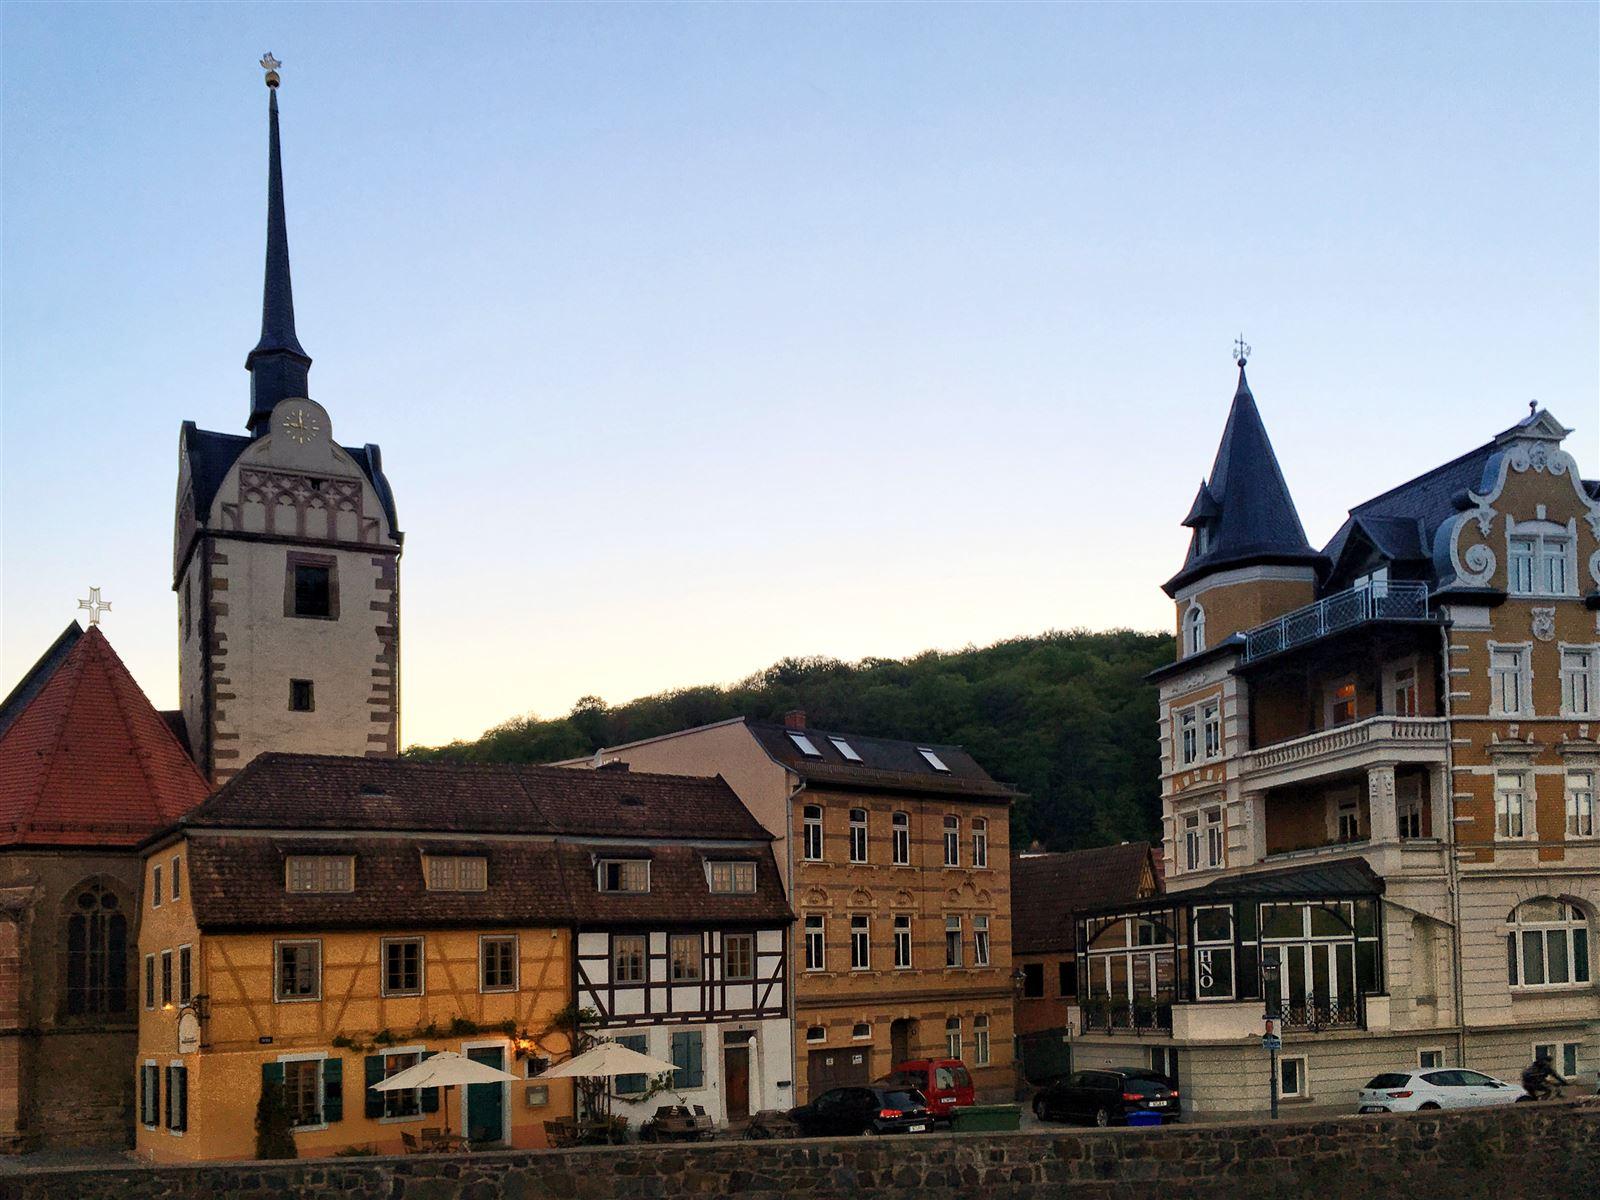 Thüringen - Gera Untermhaus - Ausflug / Spaziergang - Lummersches Backhaus